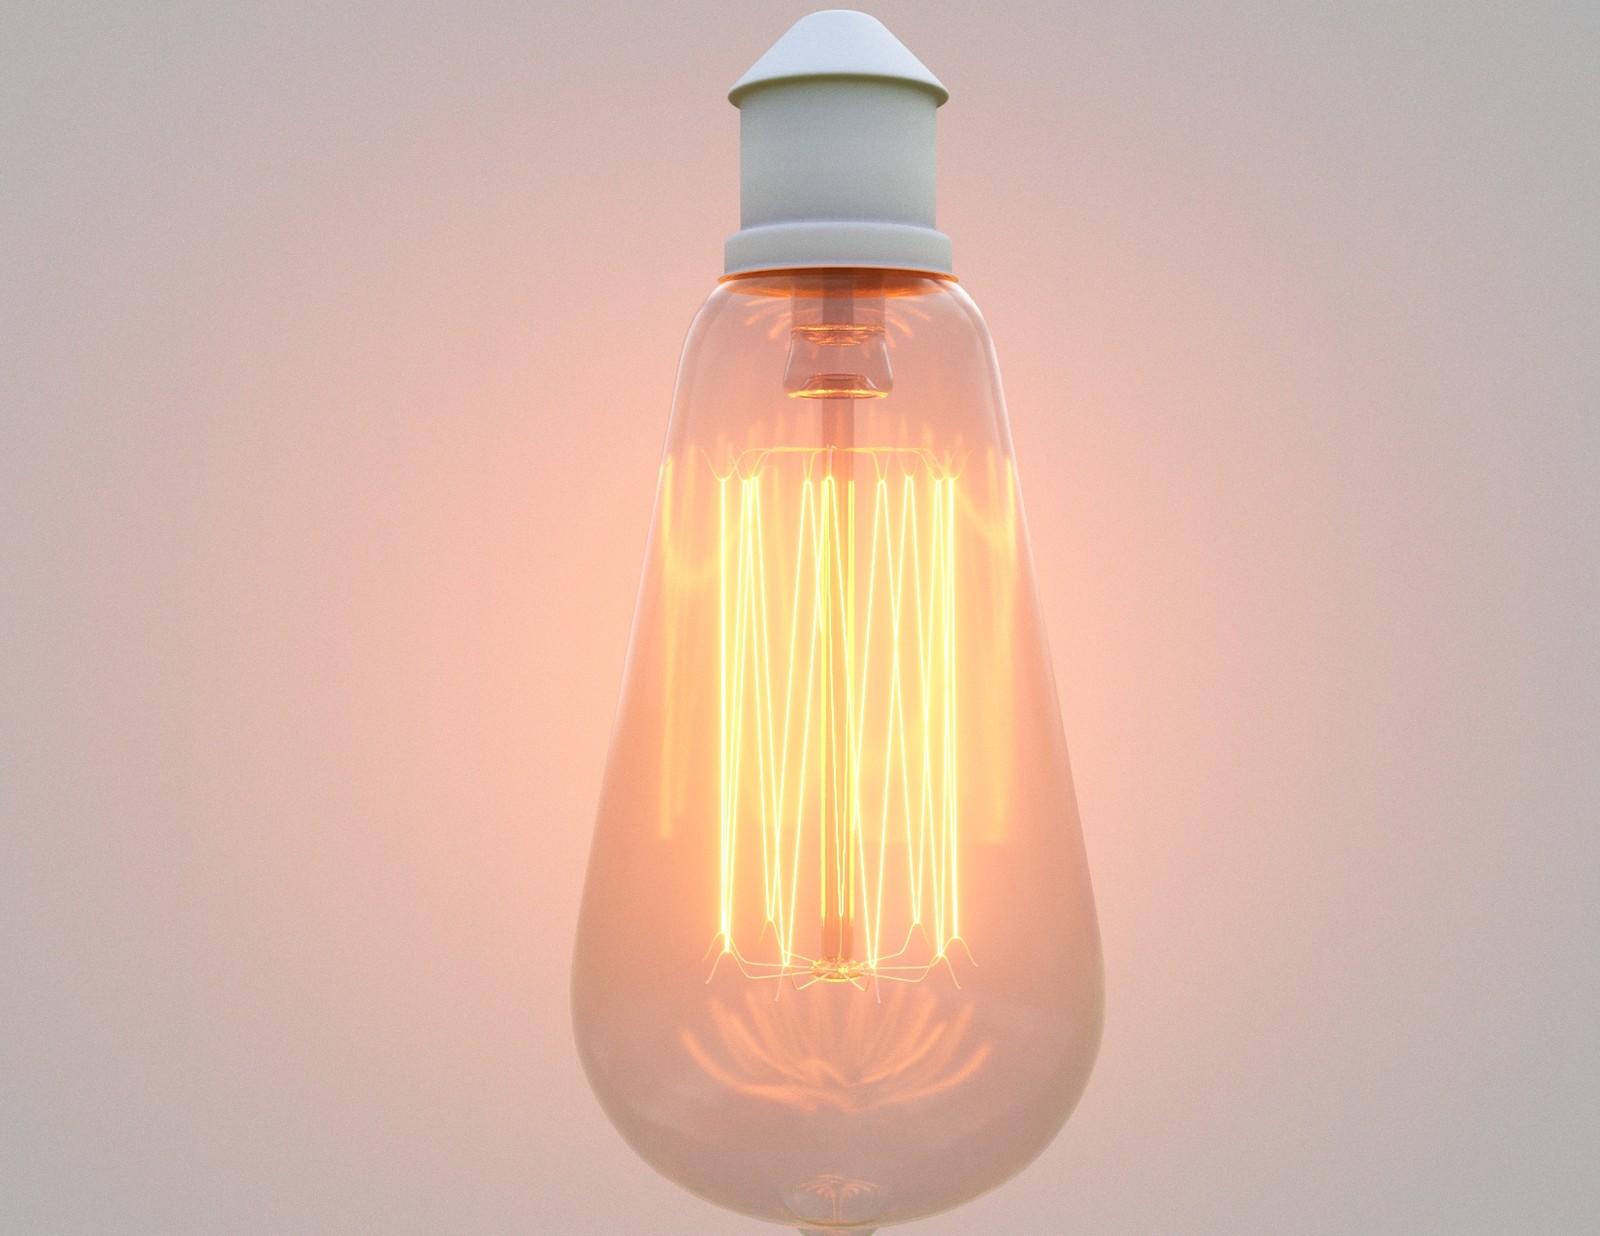 Incandescent Light Test 03. LightMtl - Intensity=500. Temp=2700K. Glass - Refraction=0.9. Color=255. Glossiness=1. IOR=1.52.  Reflection=1. Color=128. Glossiness=0.9. FrIOR=1.52. Translucency=1. Color=323D3D (Hex). Bloom=5. Glare=0.1